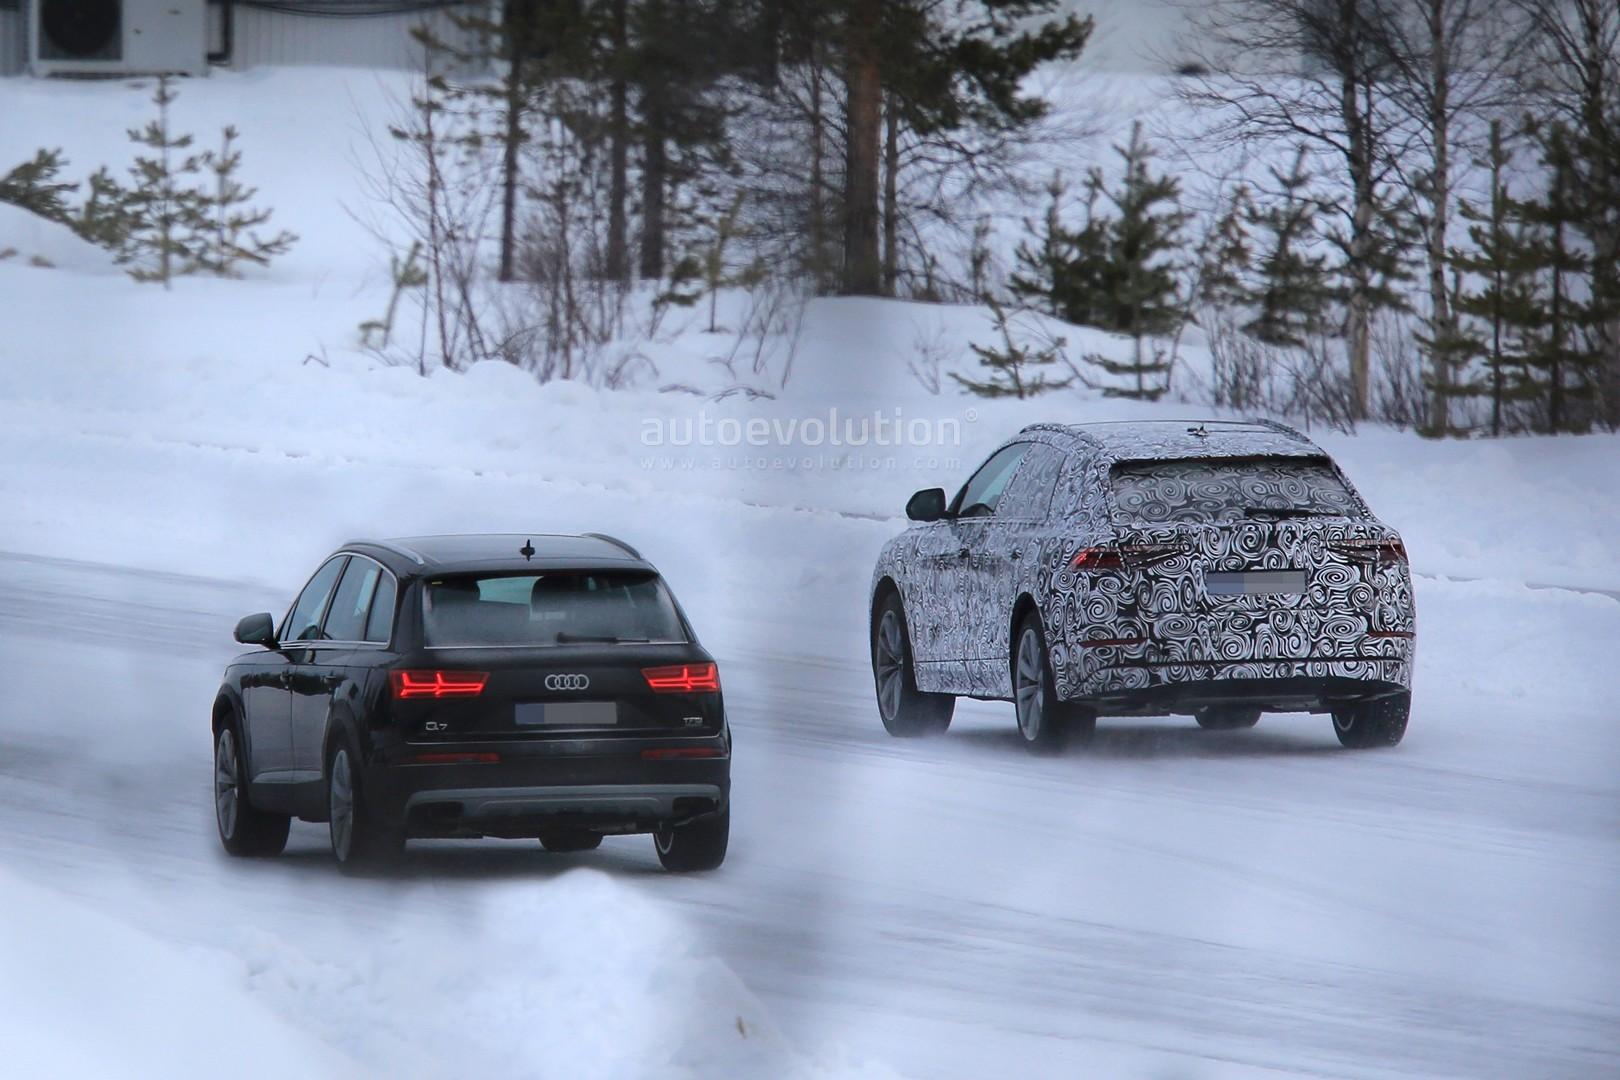 2018 Audi Q8 Vs Q7 Front And Back Spyshots Comparison Autoevolution